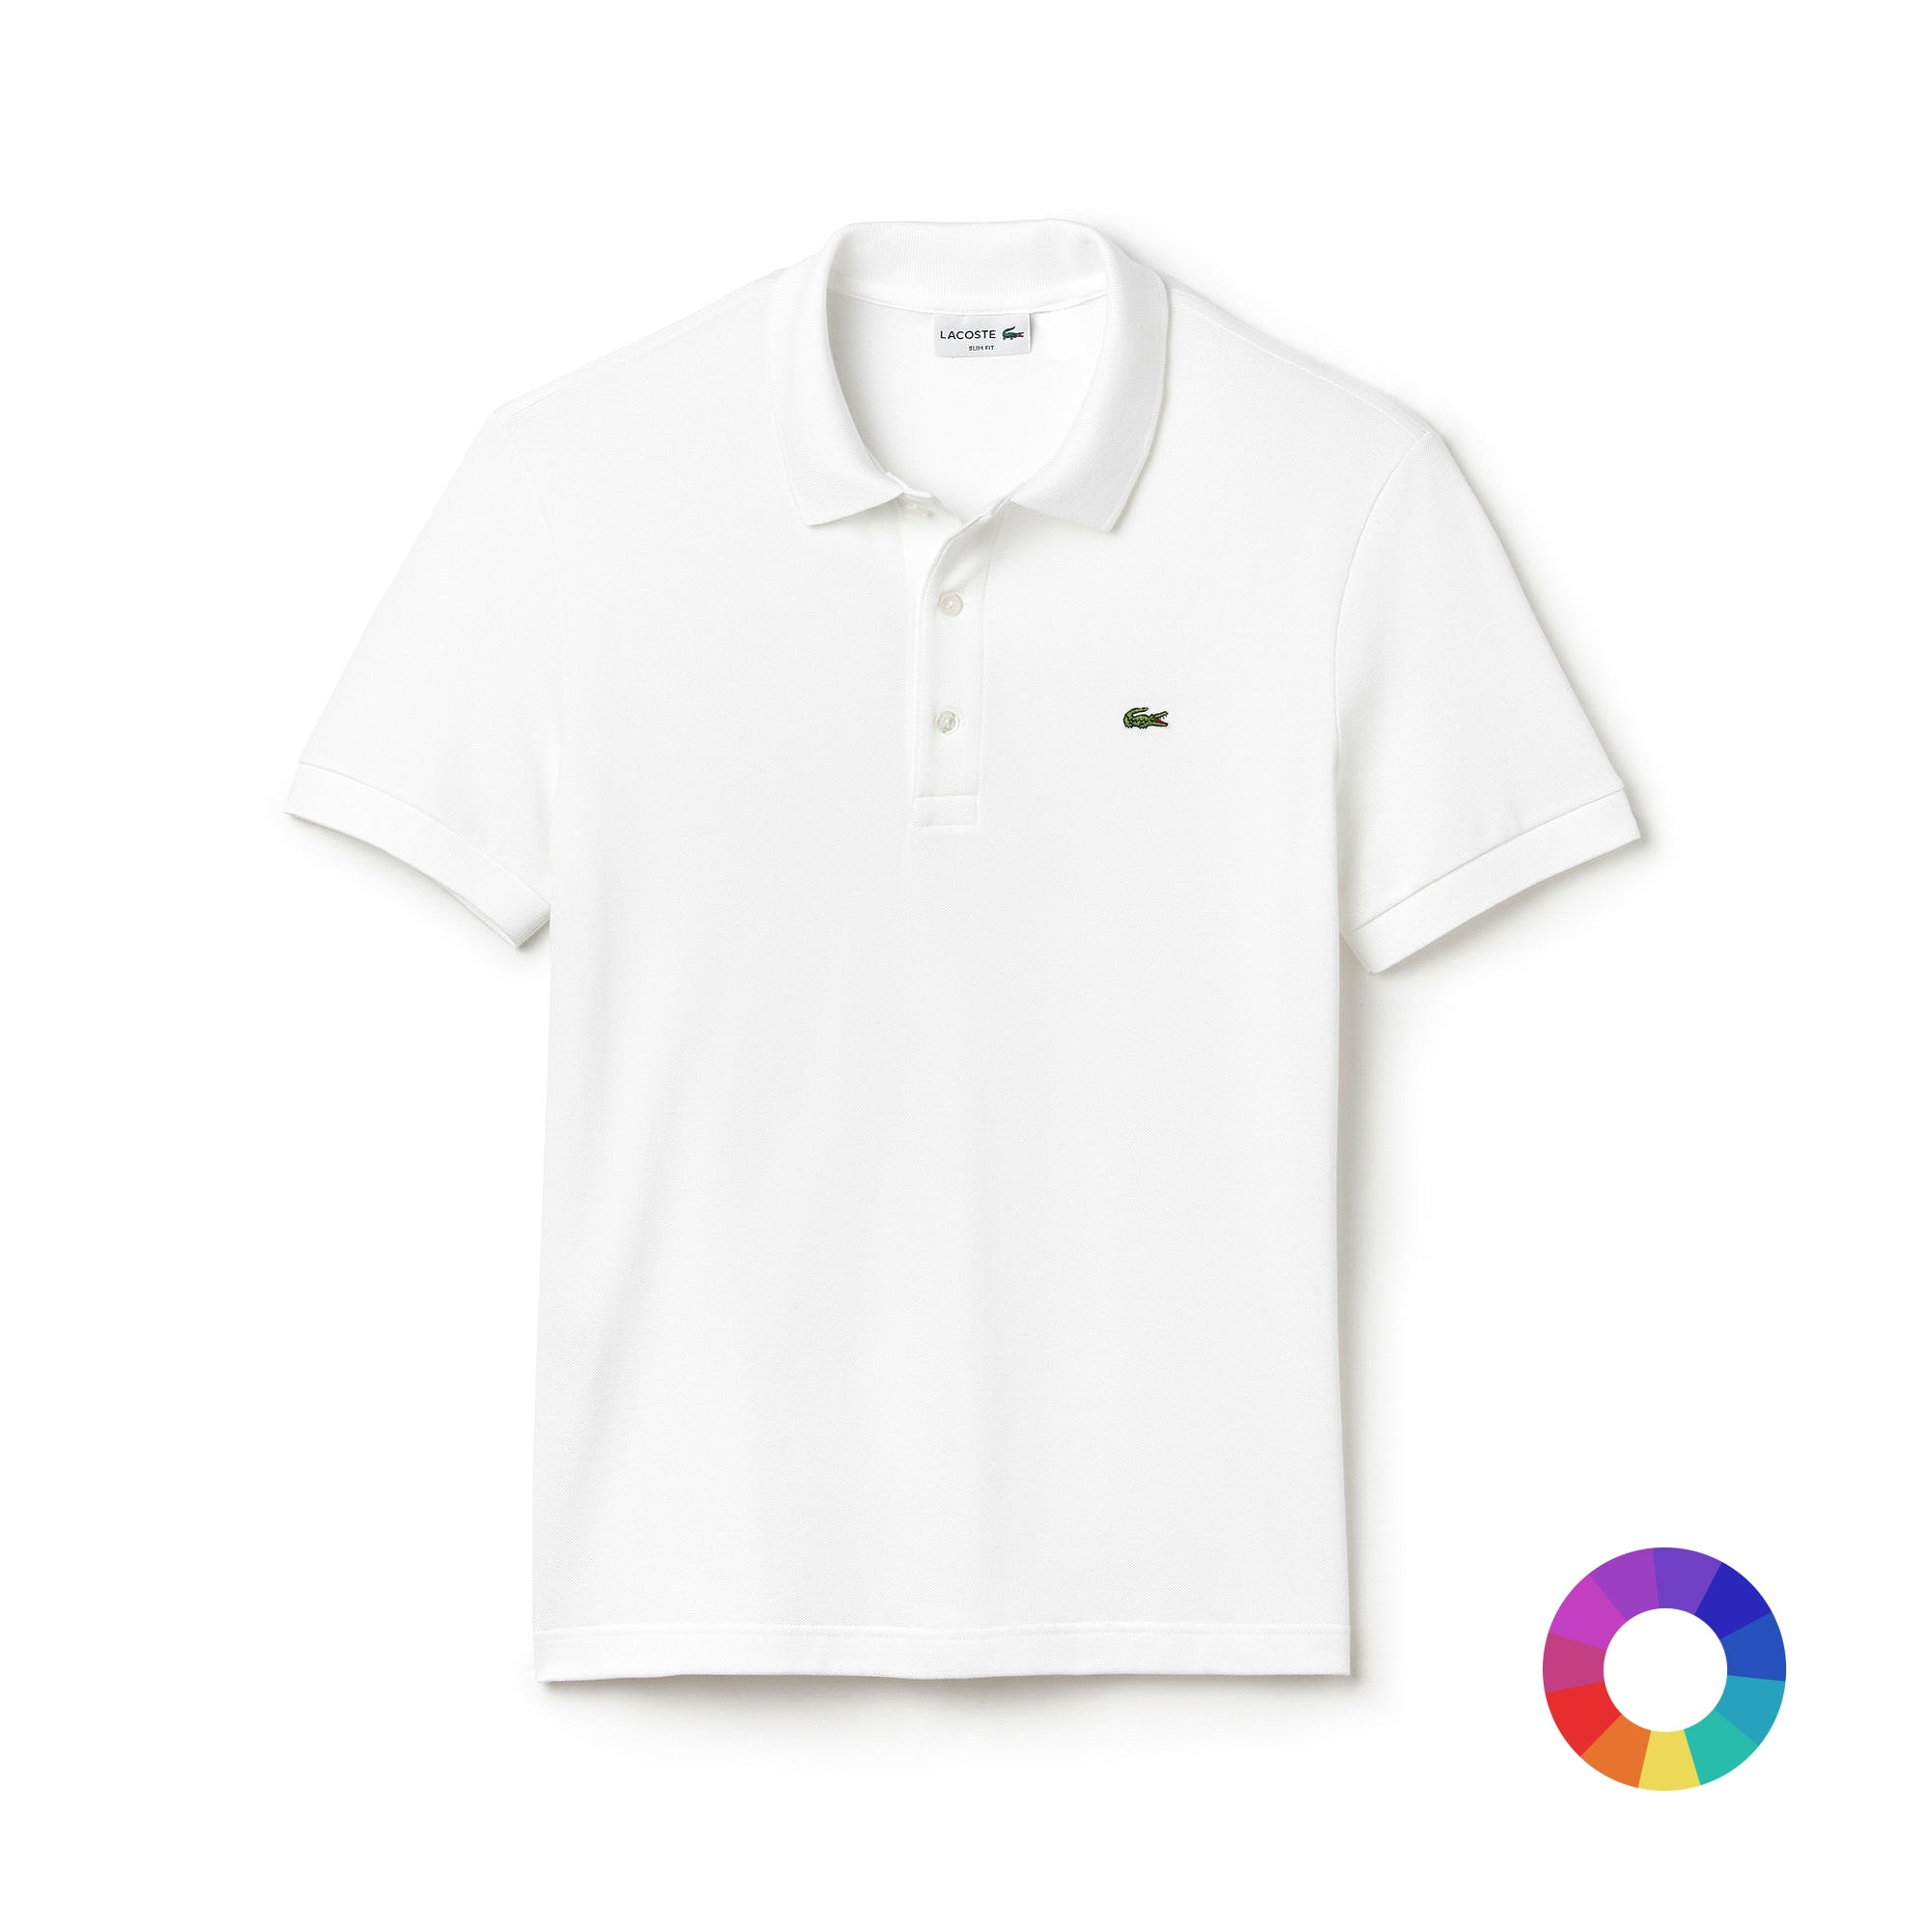 Personalized Original Fit L.12.12 Lacoste Polo